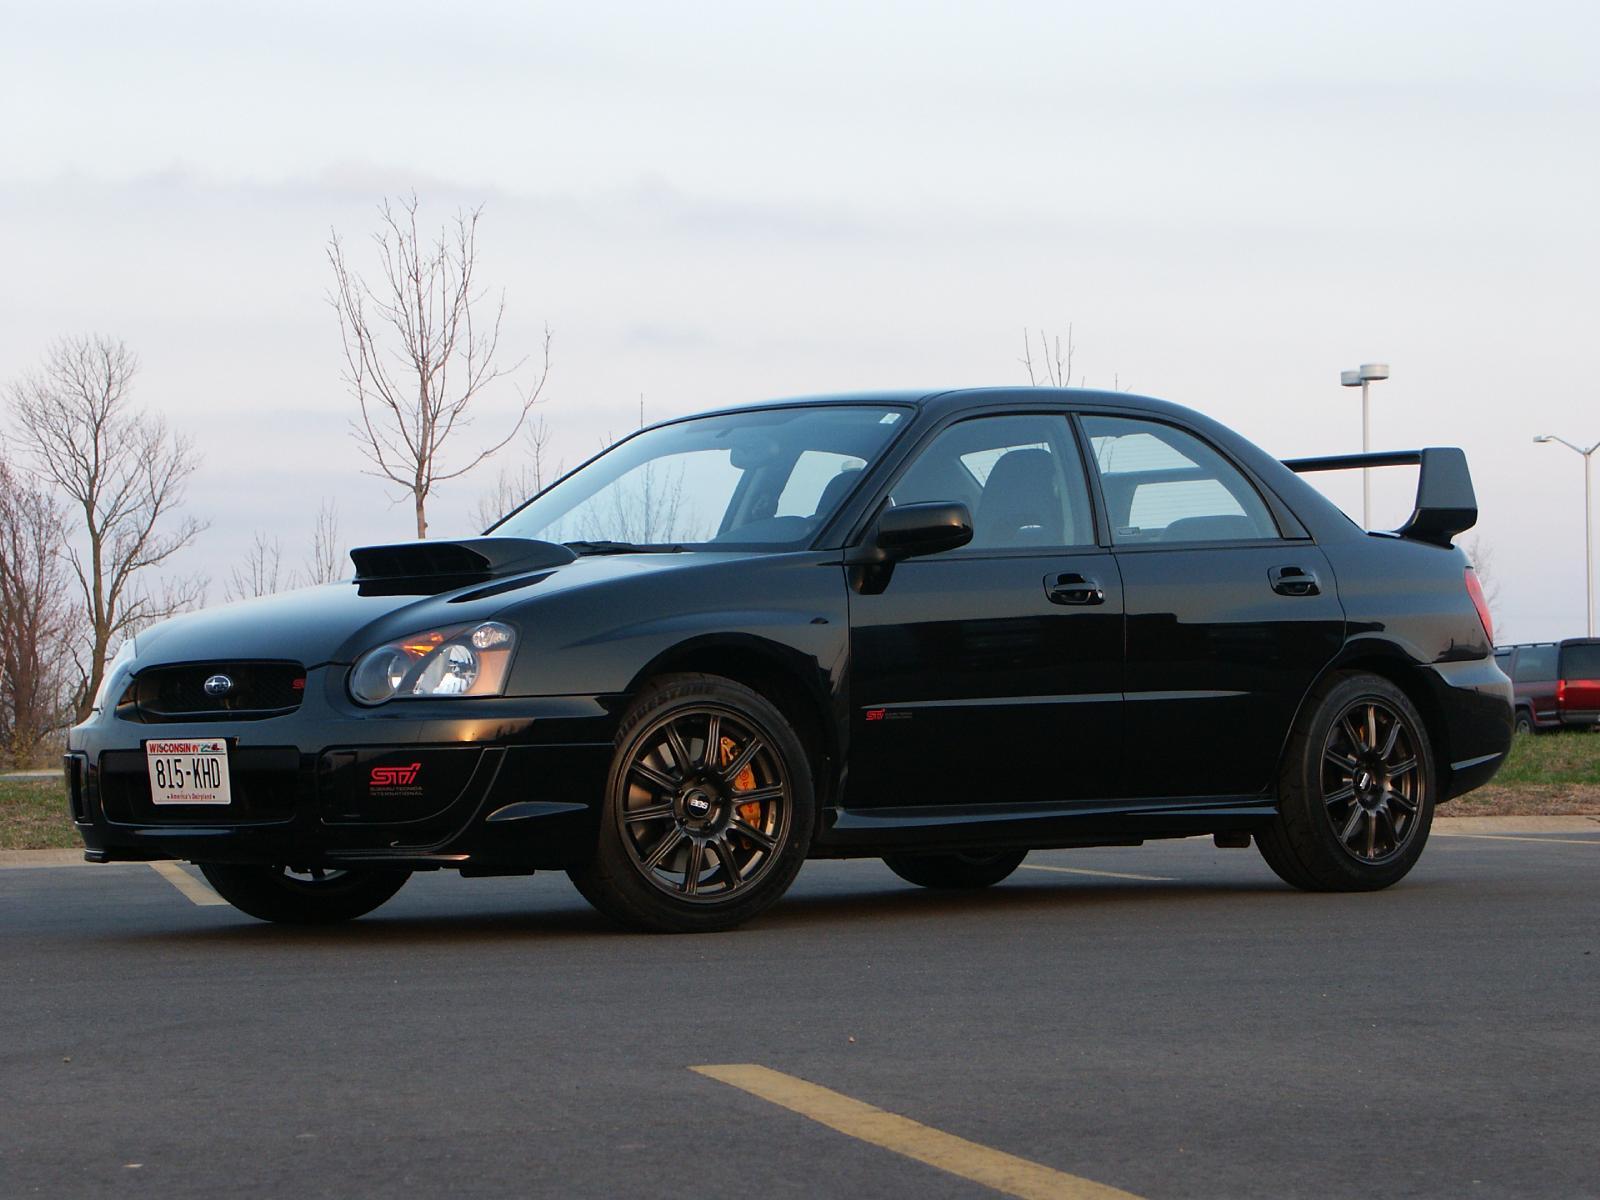 Wrx Sti 0 60 >> 2005 Subaru Impreza Wrx Sti 1 4 Mile Trap Speeds 0 60